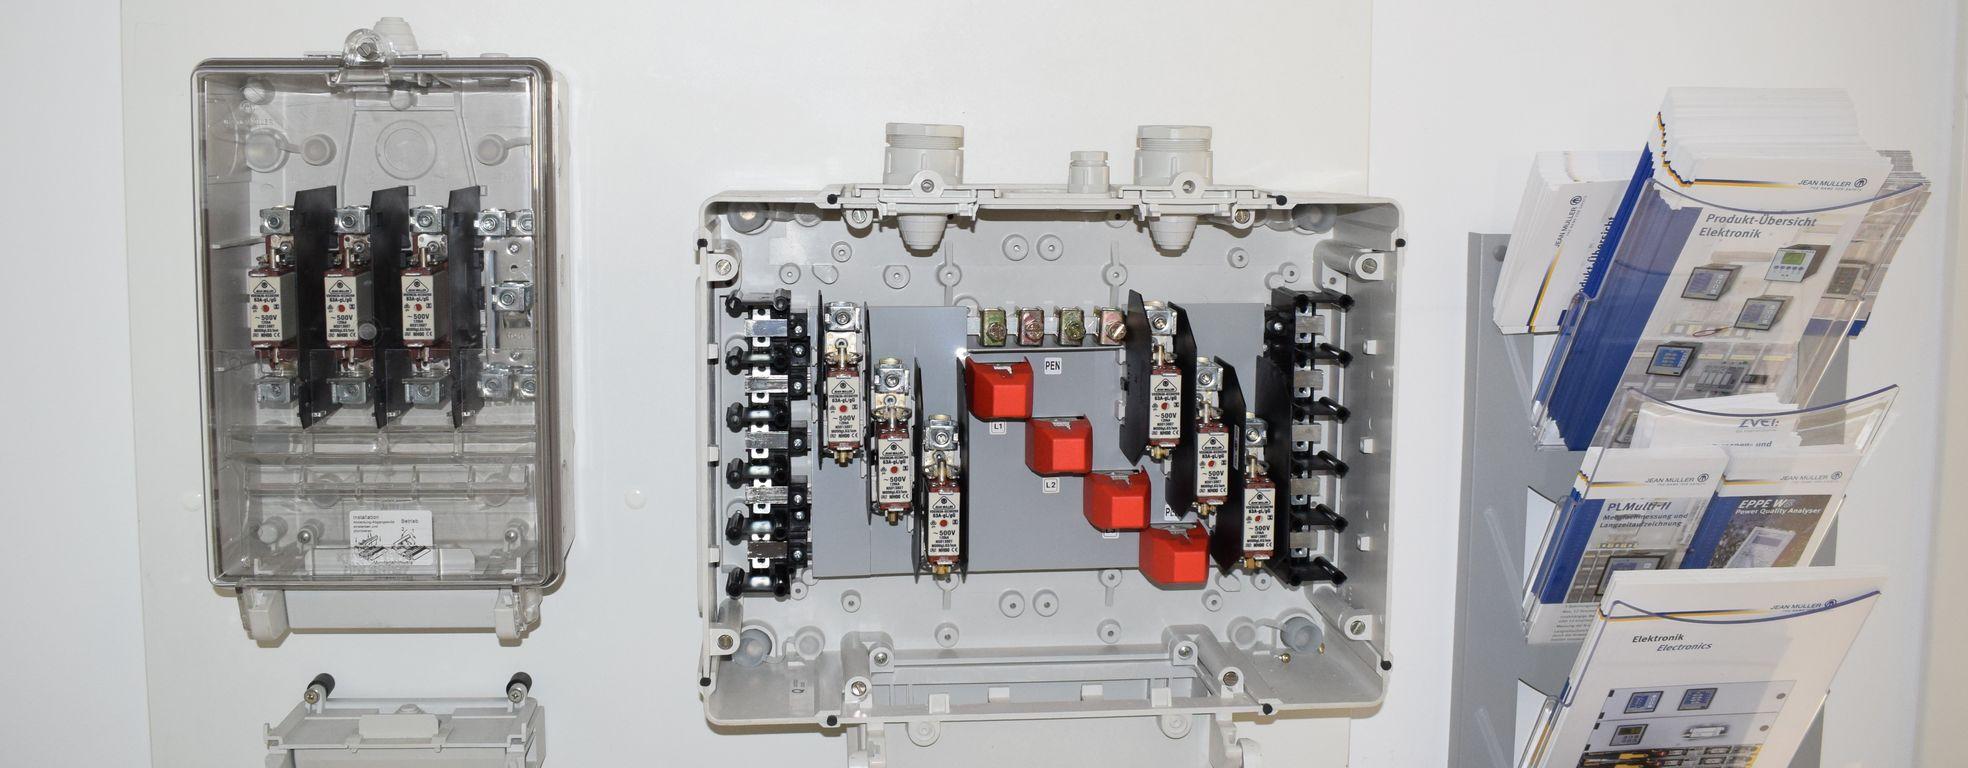 e.t.v.habig GmbH